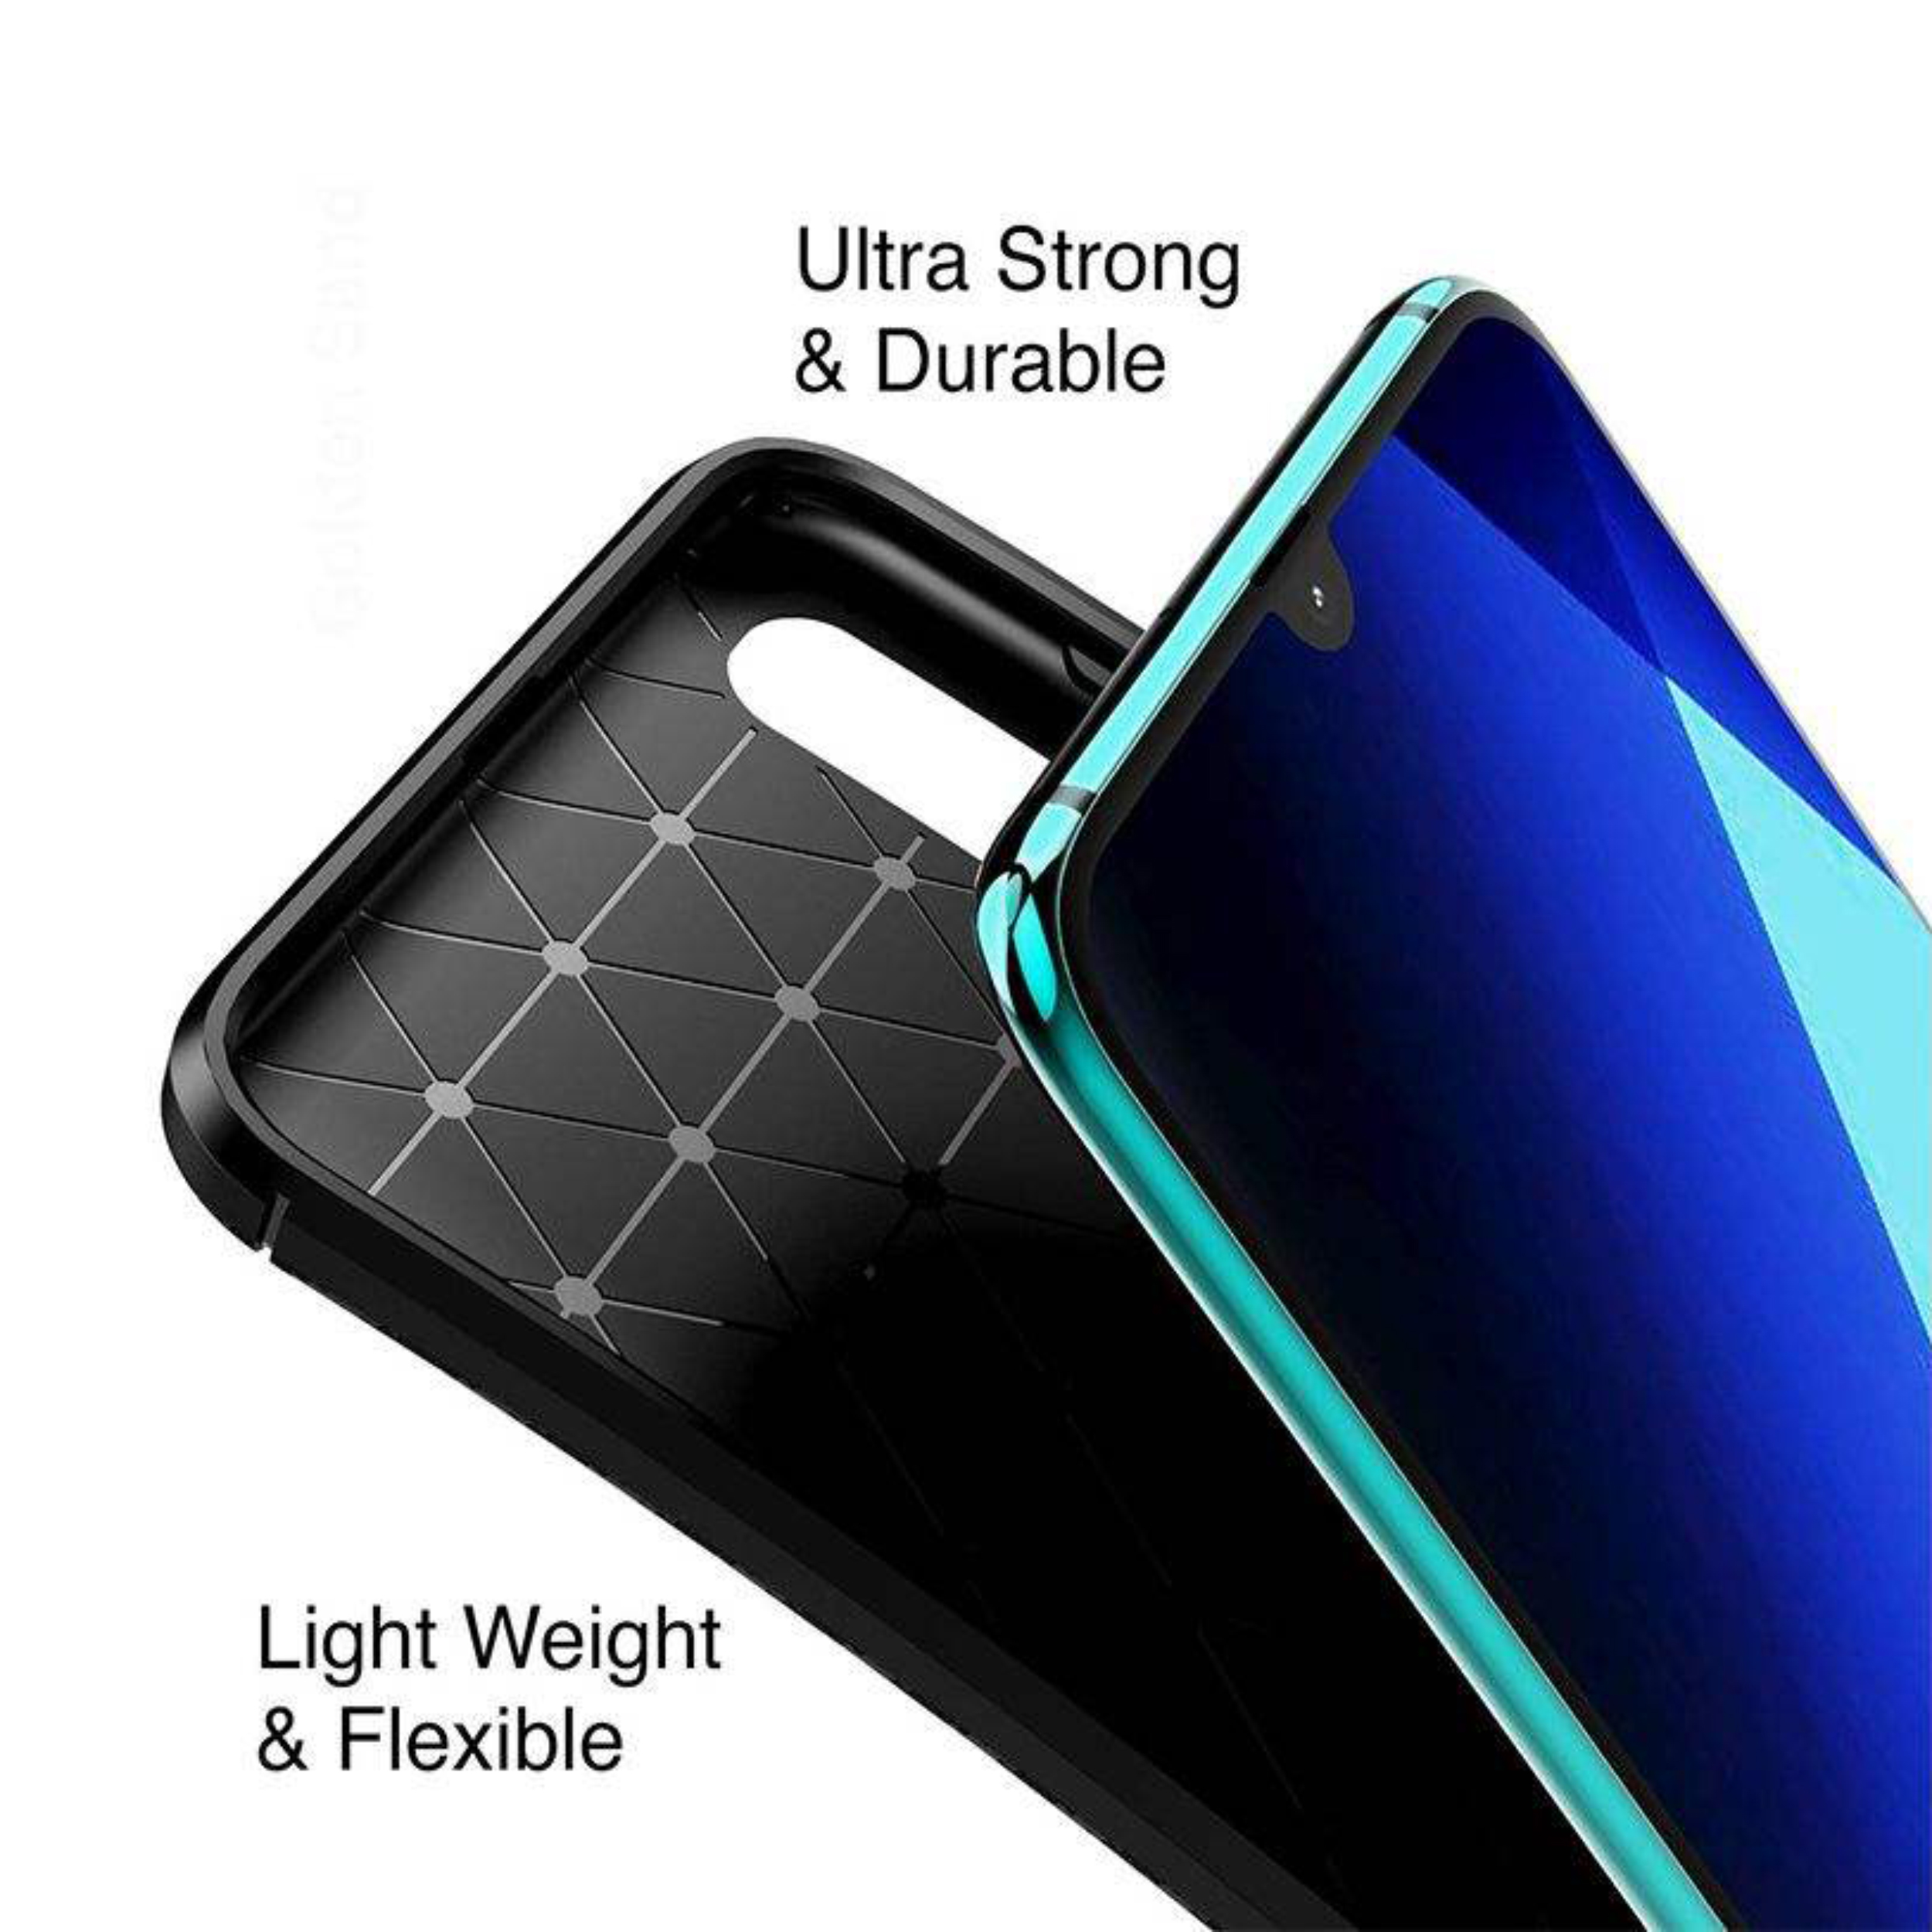 کاور لاین کینگ مدل A21 مناسب برای گوشی موبایل سامسونگ Galaxy A50/A50s/A30s thumb 2 6